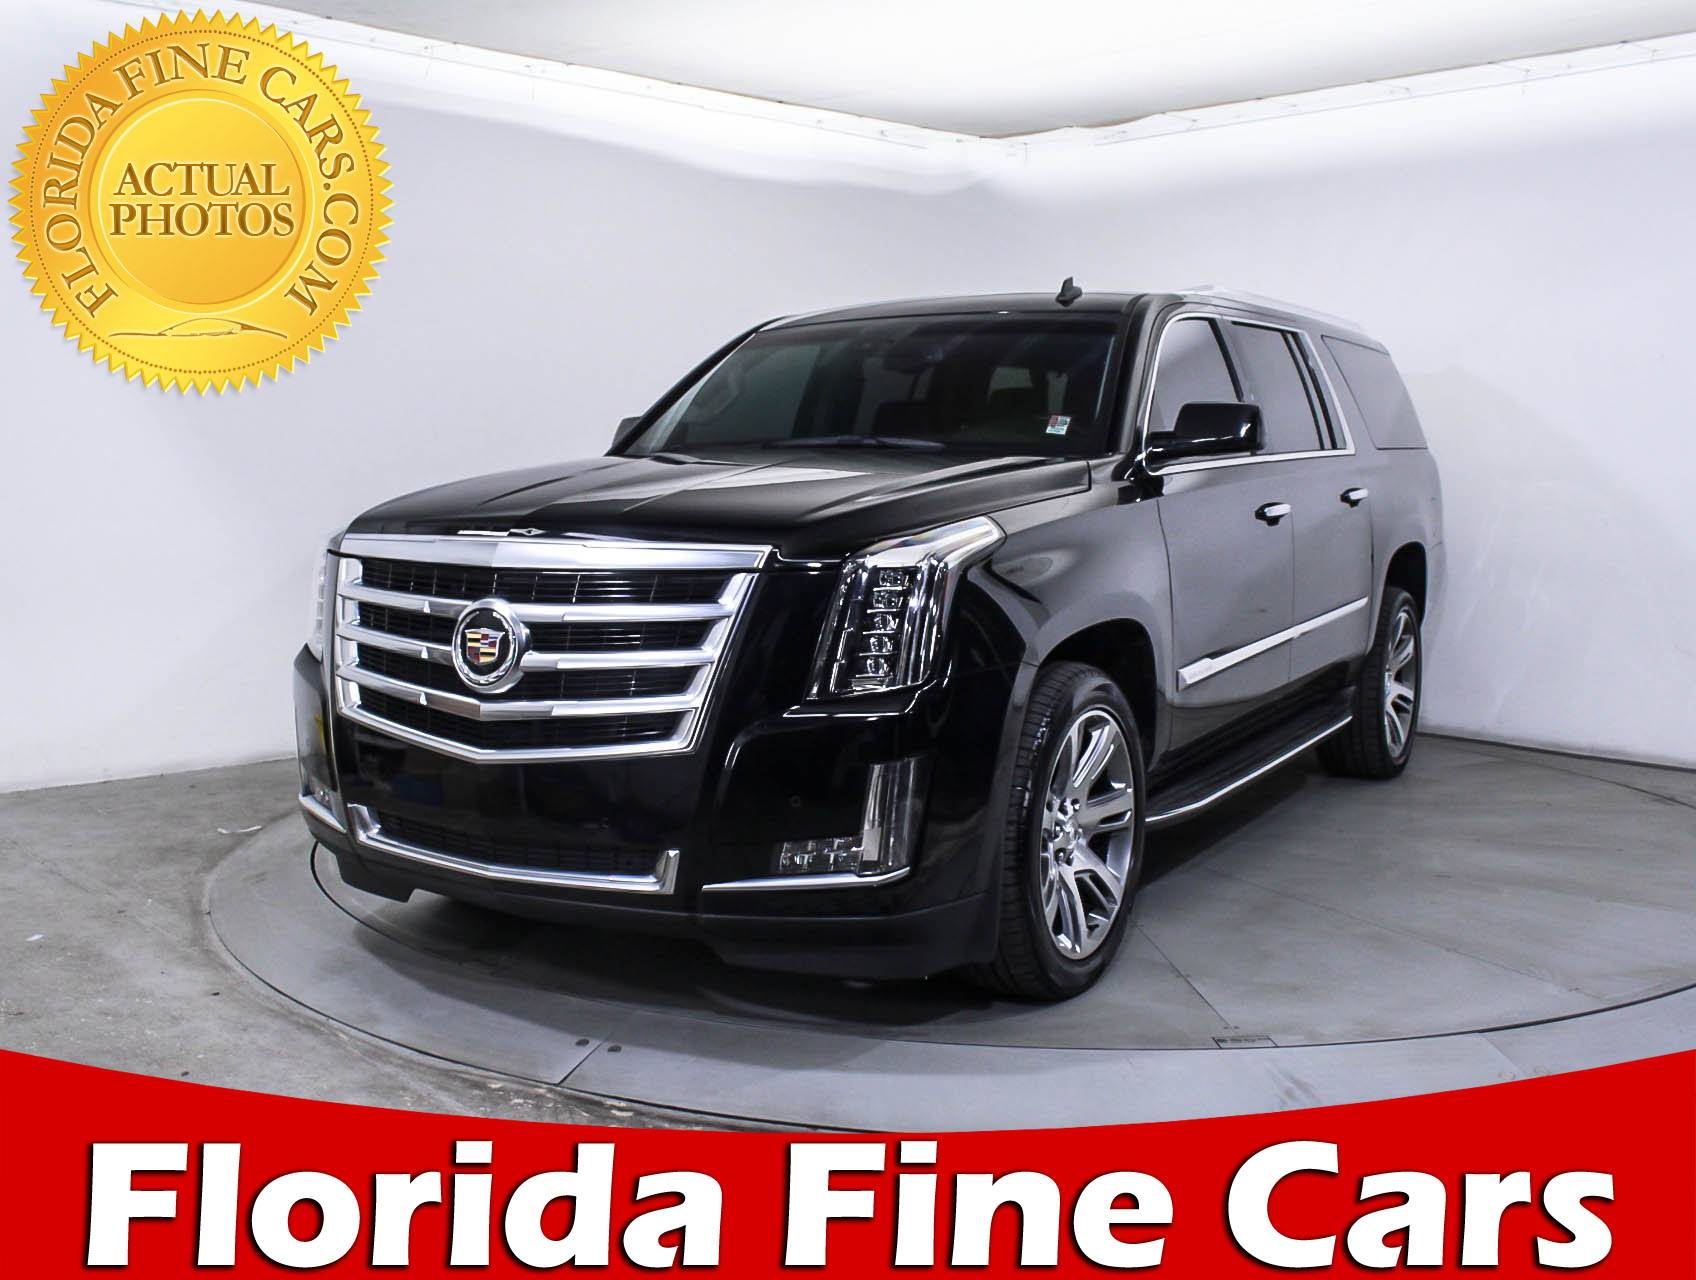 Used 2015 Cadillac Escalade Esv Luxury Suv For Sale In West Palm Fl Gmc 88470 Florida Fine Cars